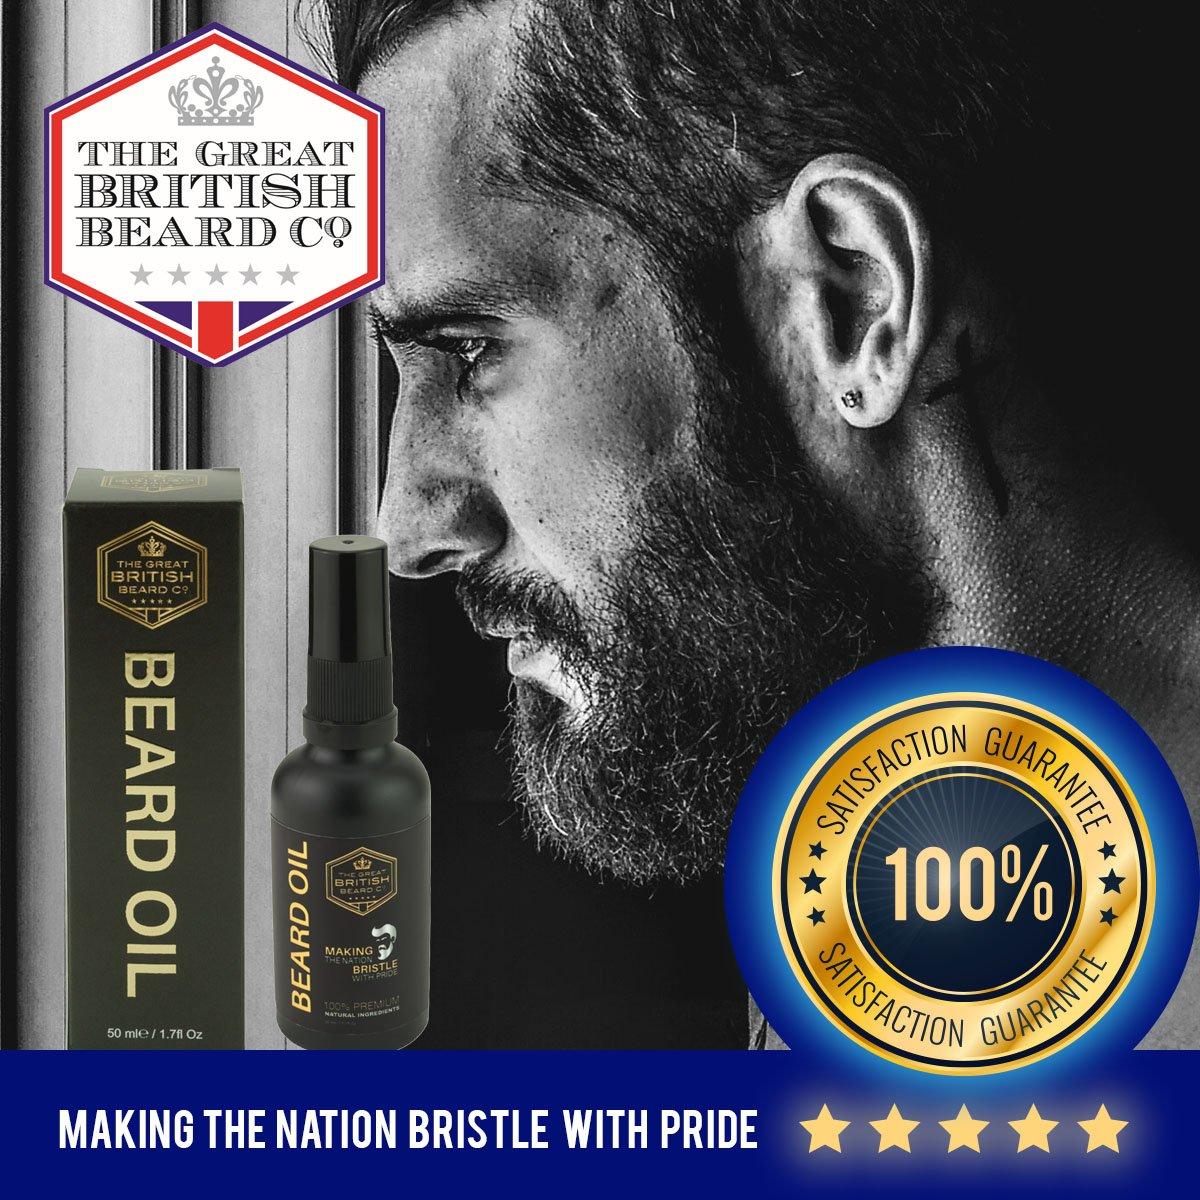 Beard Oil - Leave-in Conditioner - MADE IN UK | 100% Premium Natural  Ingredients - Jojoba Oil, Argan Oil with Vitamin E | Premium Oud Fragrance  |